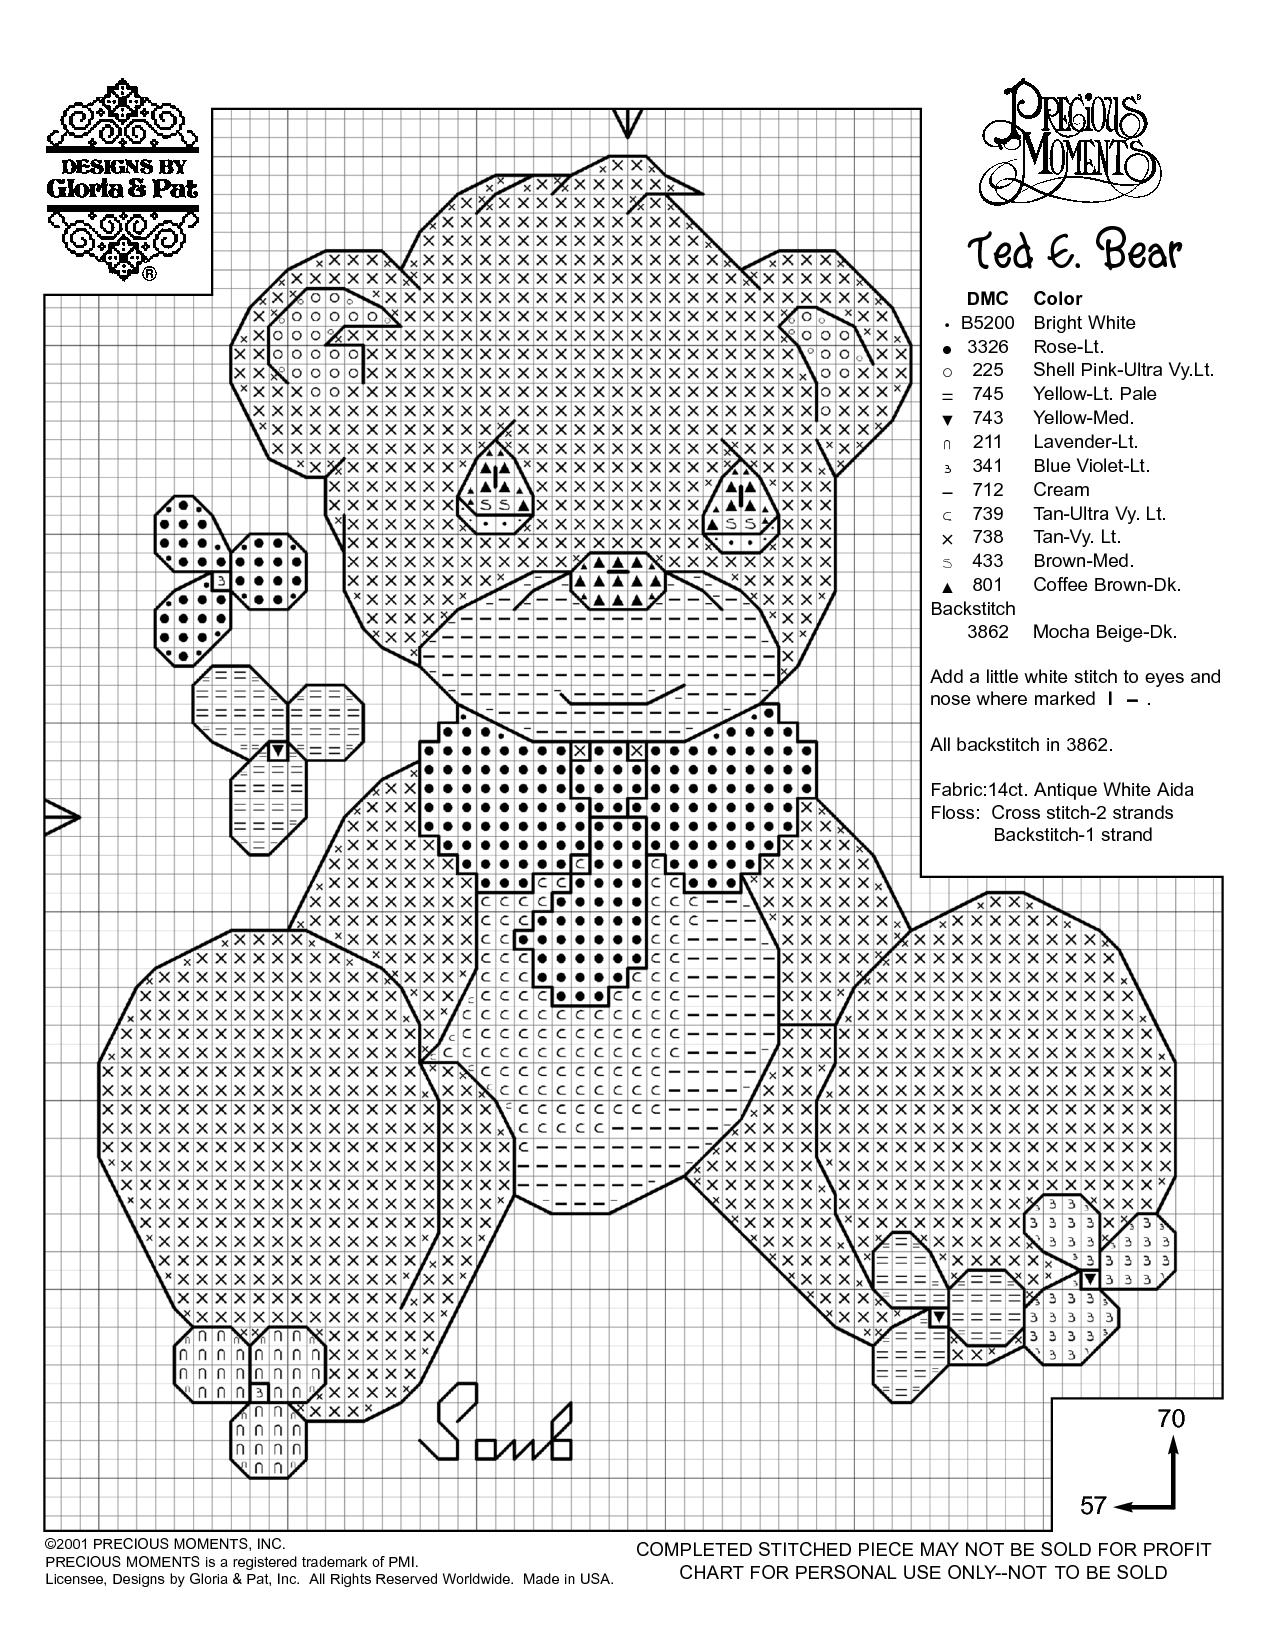 Free Printable Cross Stitch Patterns | Needlework Projects - Baby Cross Stitch Patterns Free Printable